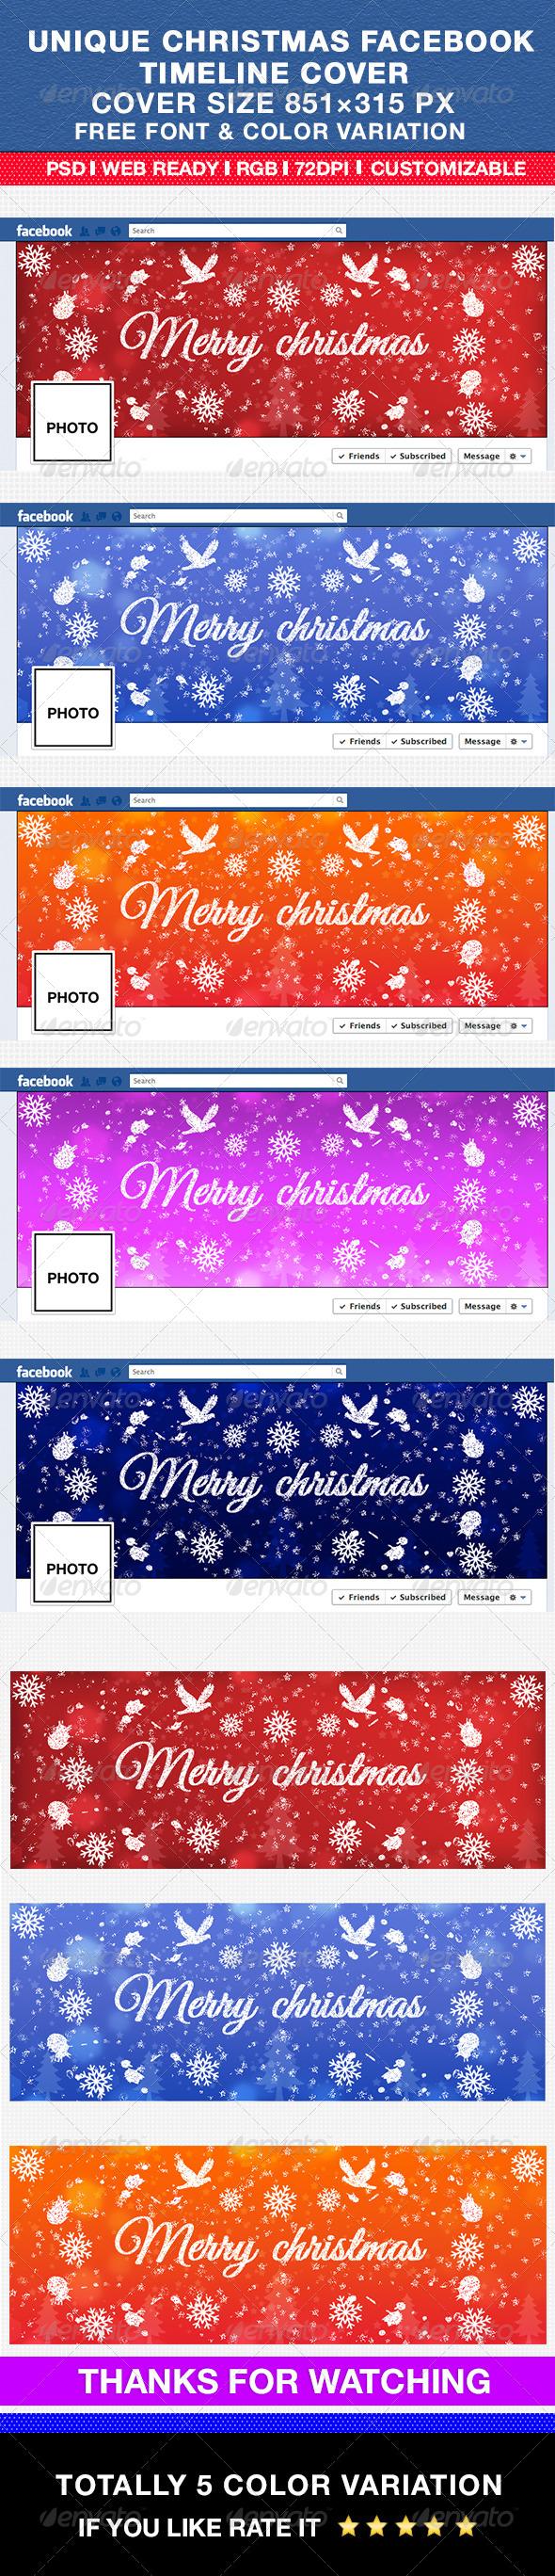 Unique Christmas Facebook Timeline Cover - Facebook Timeline Covers Social Media